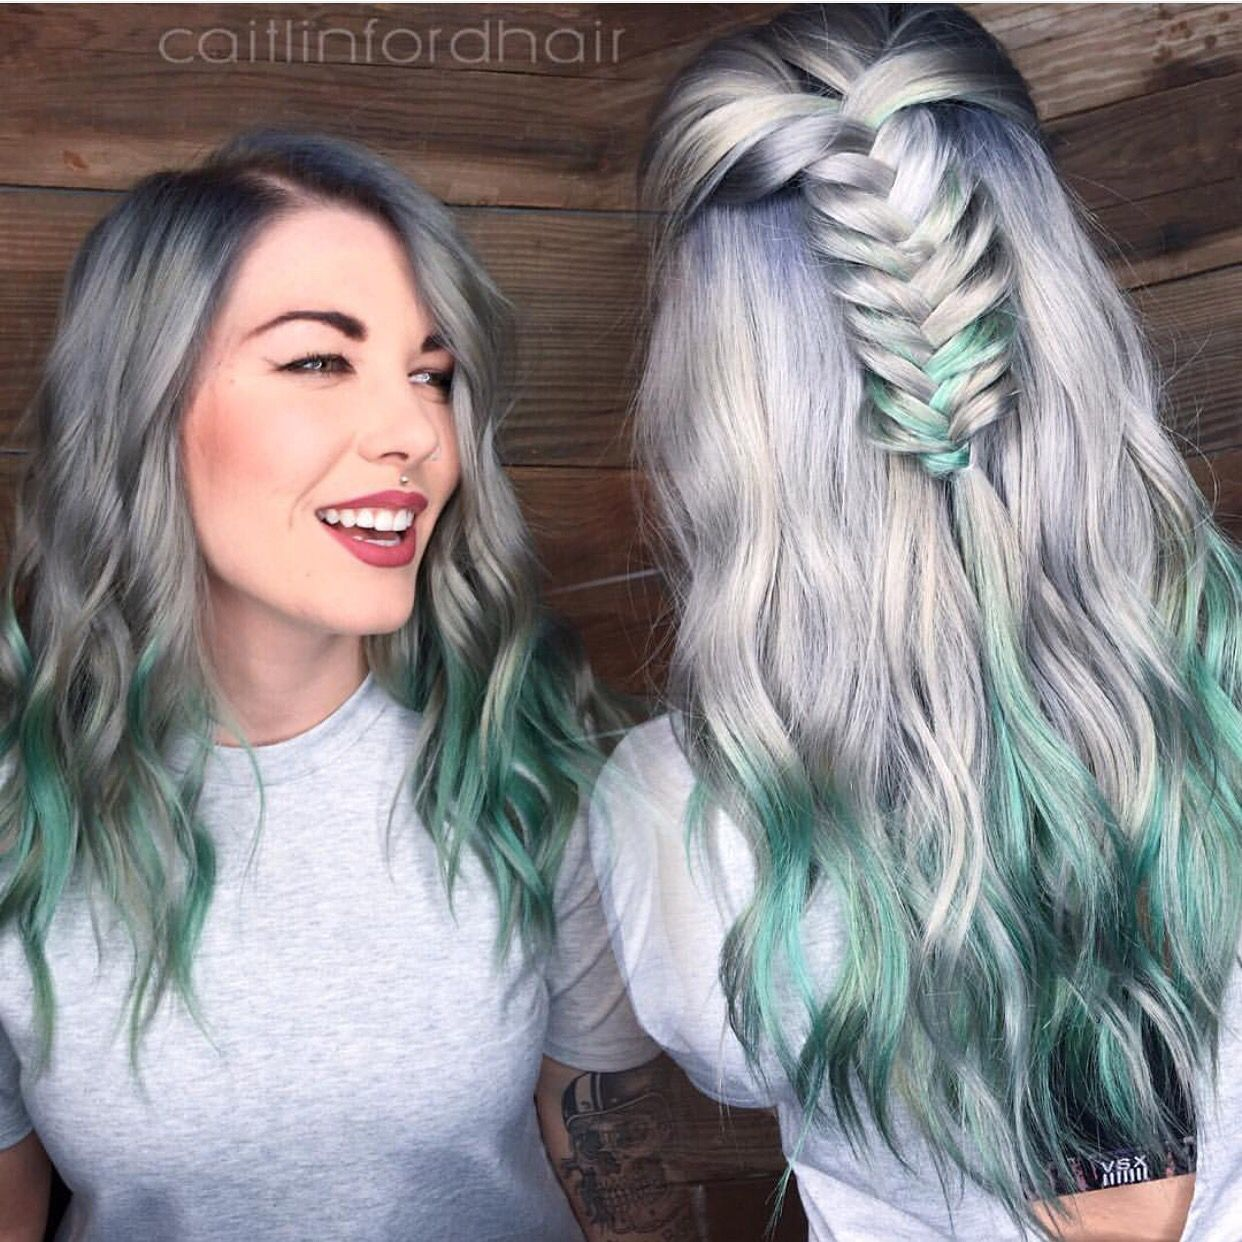 Silver Spearmint by @caitlinfordhair Beautiful artistry Caitlin! Hotonbeauty.com silver hair color green hair color